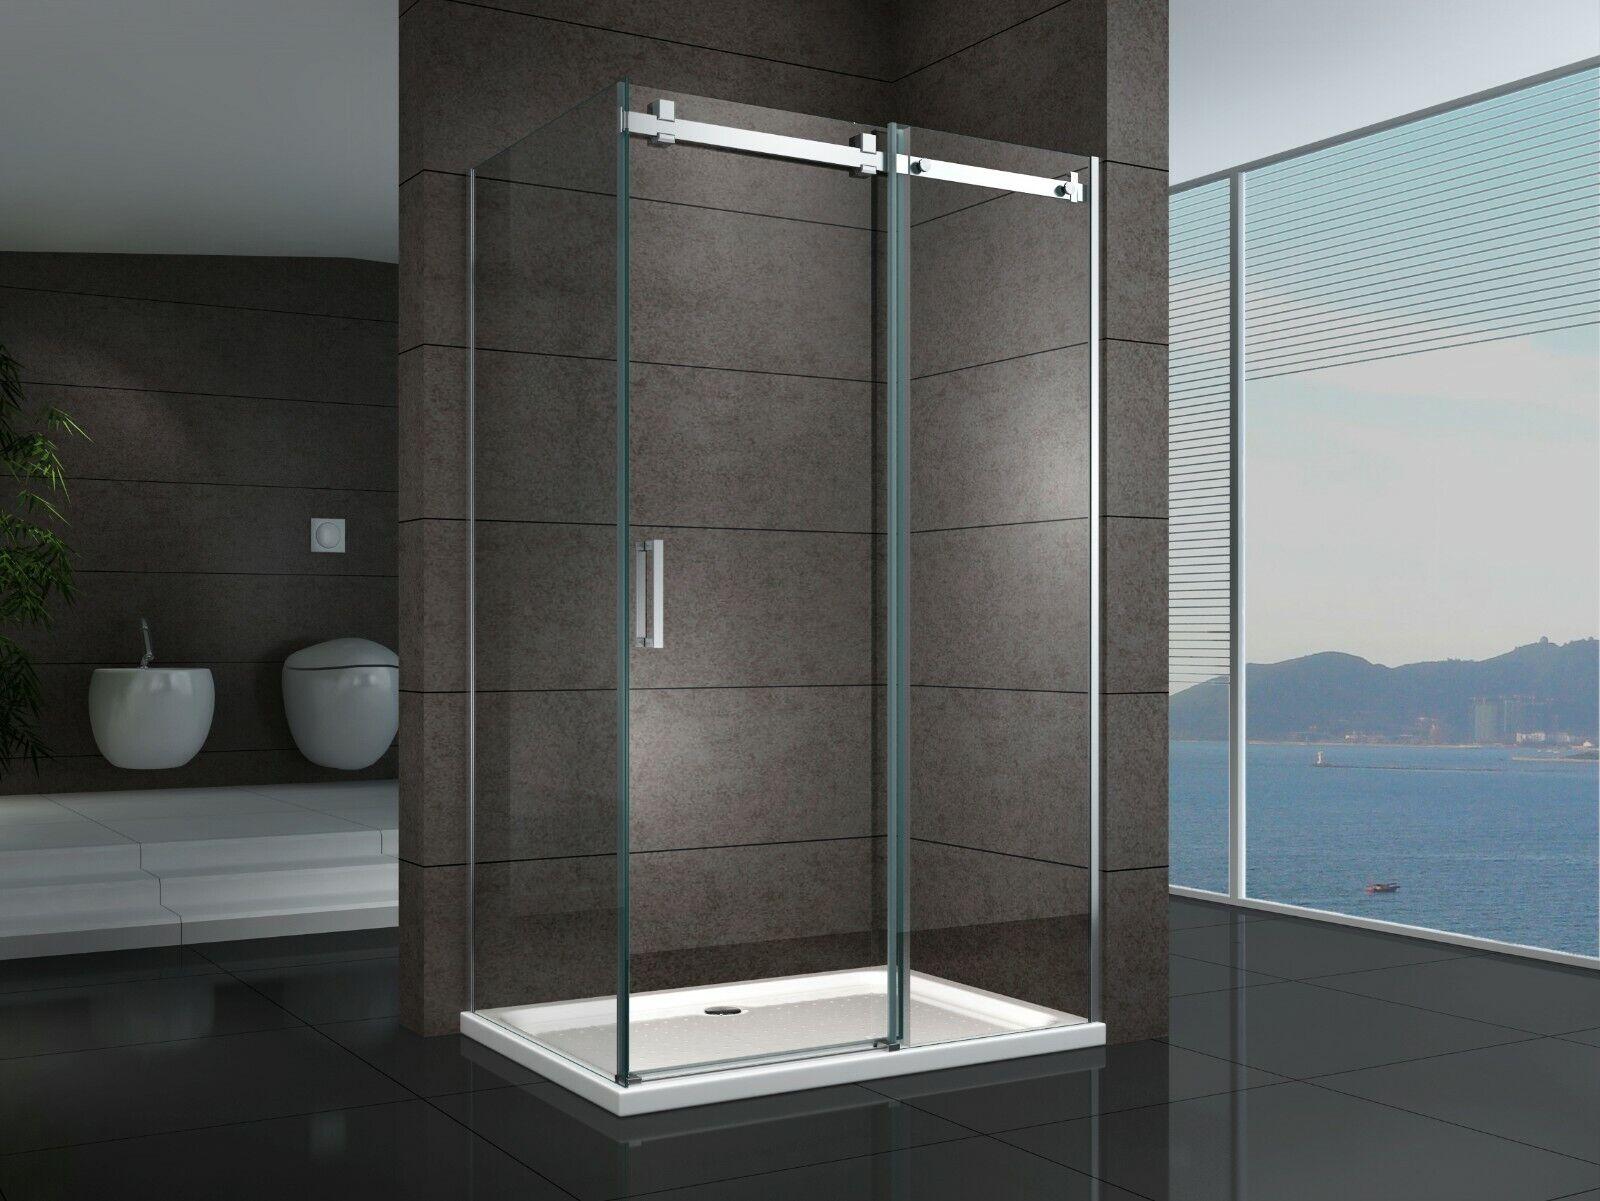 Details About Adjustable Semi Frameless Shower Screen 1100 To 1800 Mm Door X 800 900mm Panel